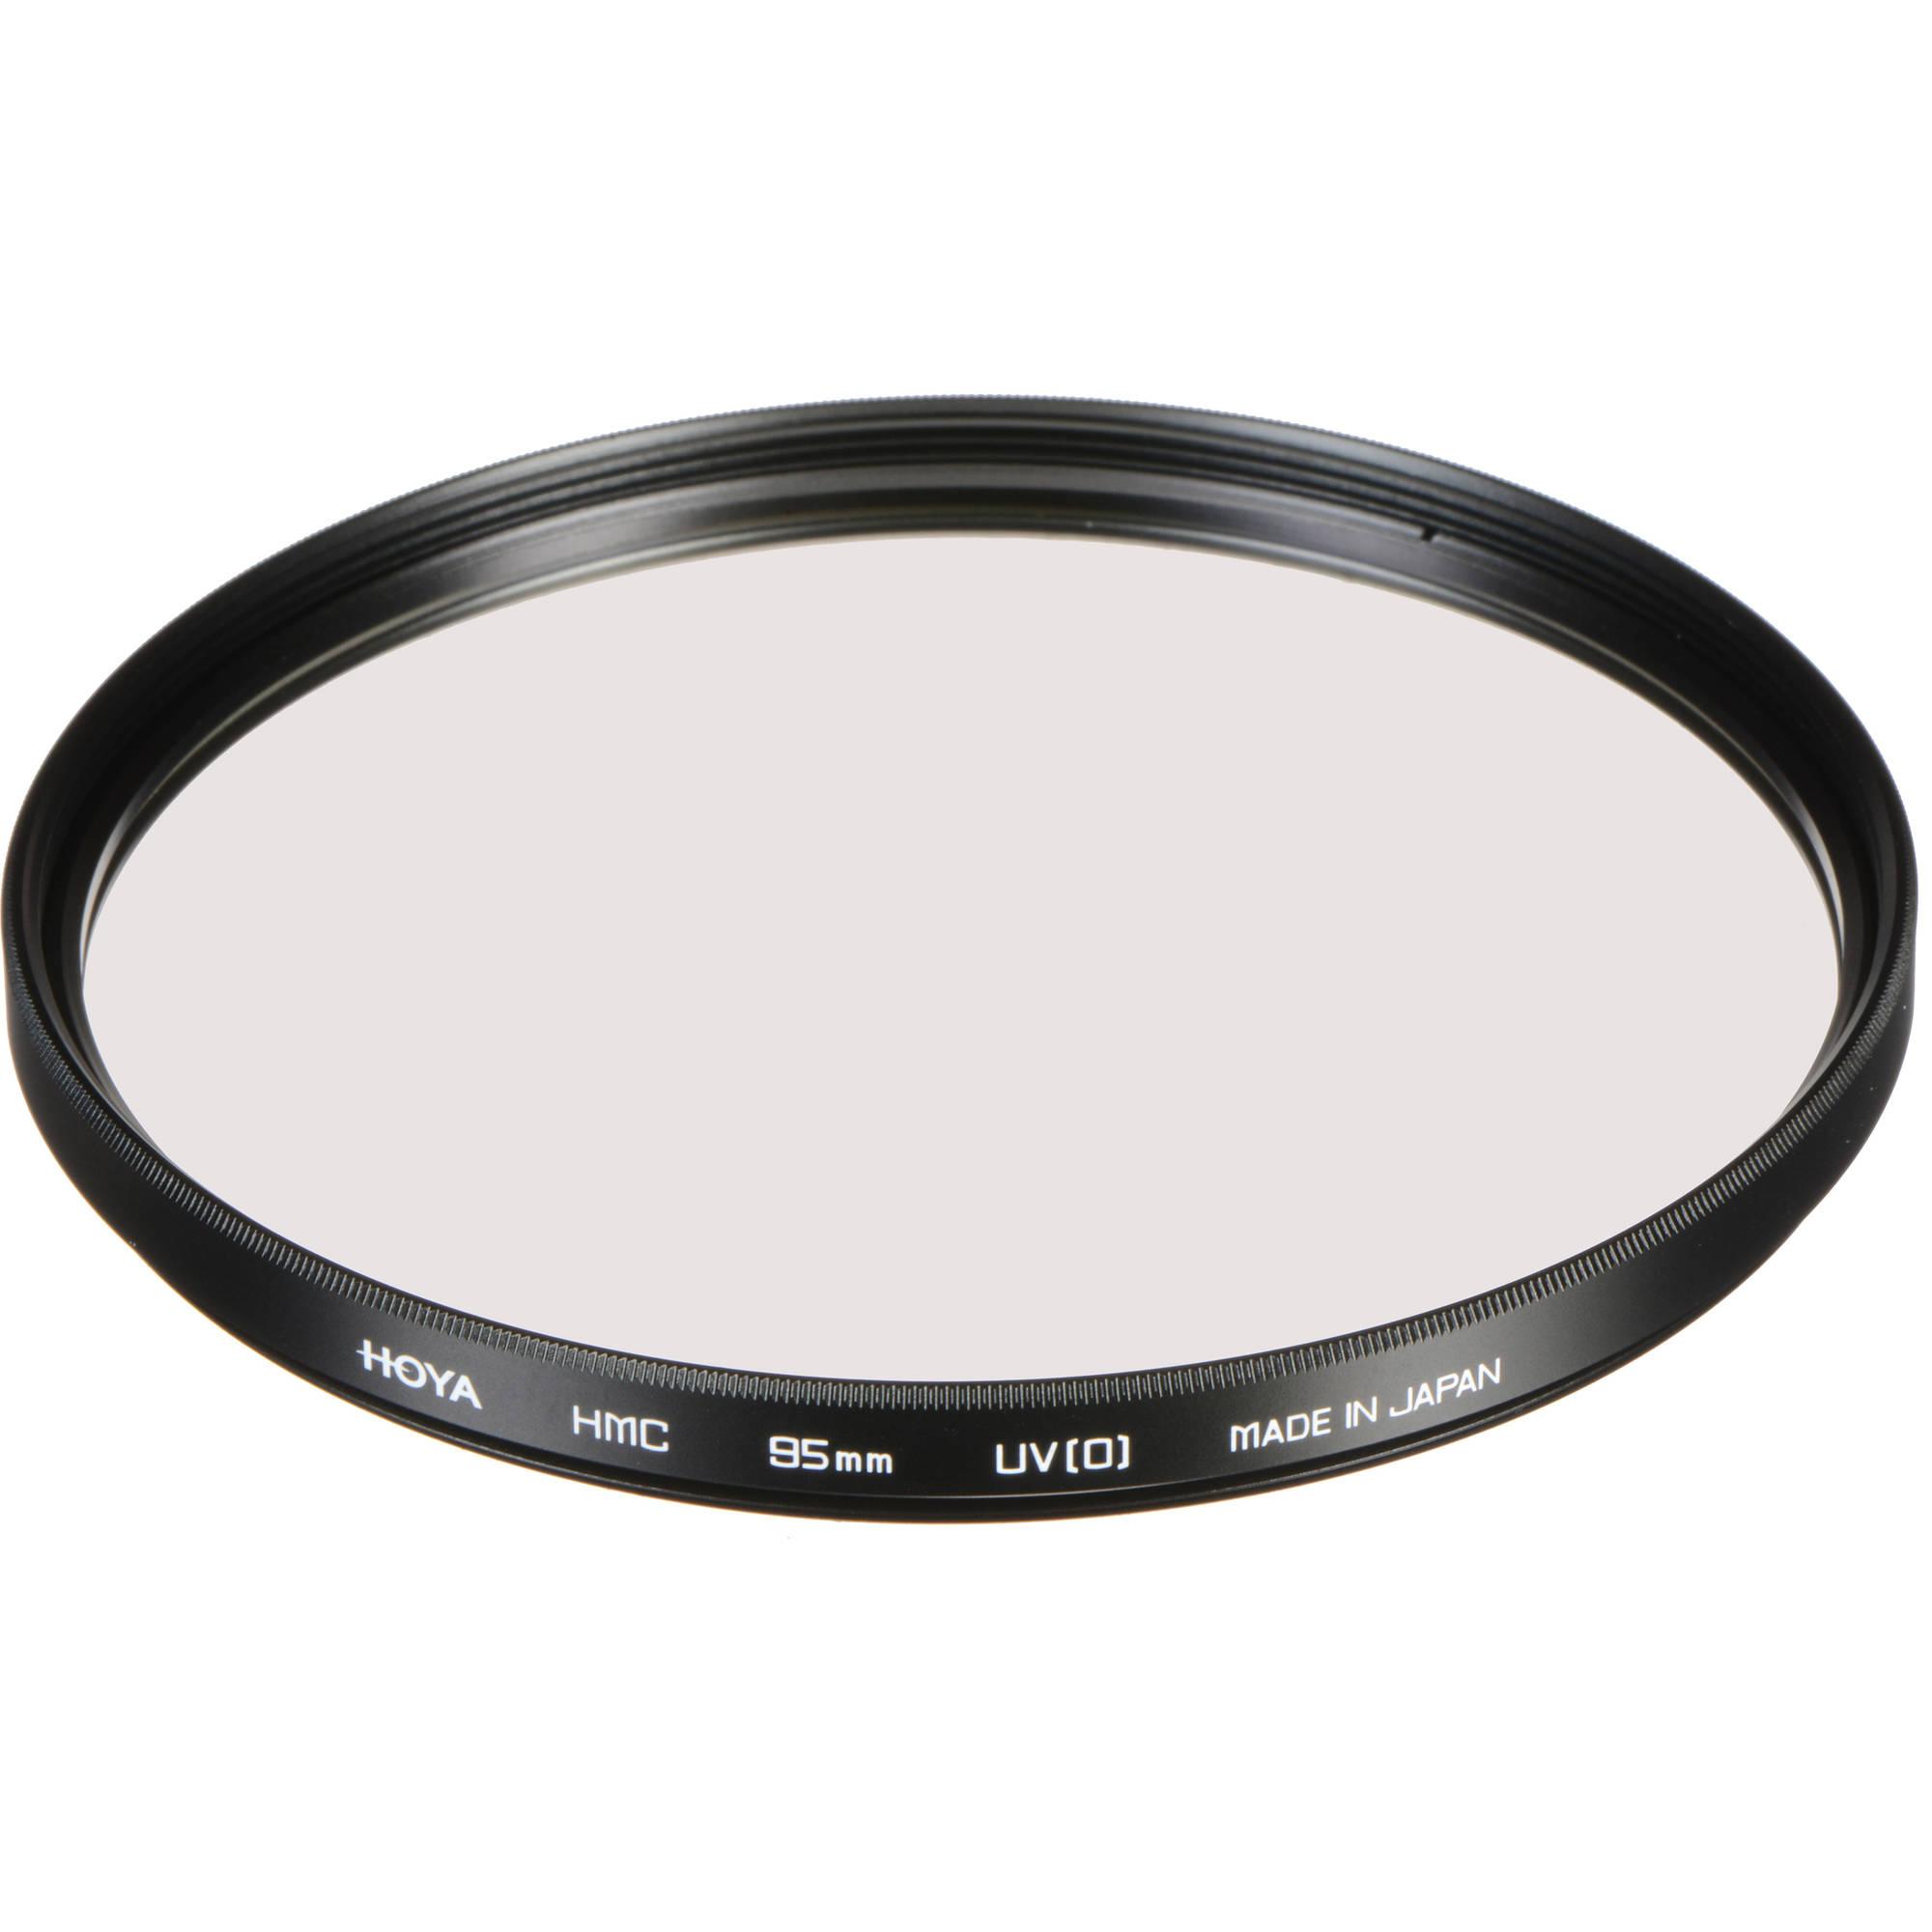 Hoya UV filter 86mm Coated Both Sides Made In Japan UV Optical The Best One!